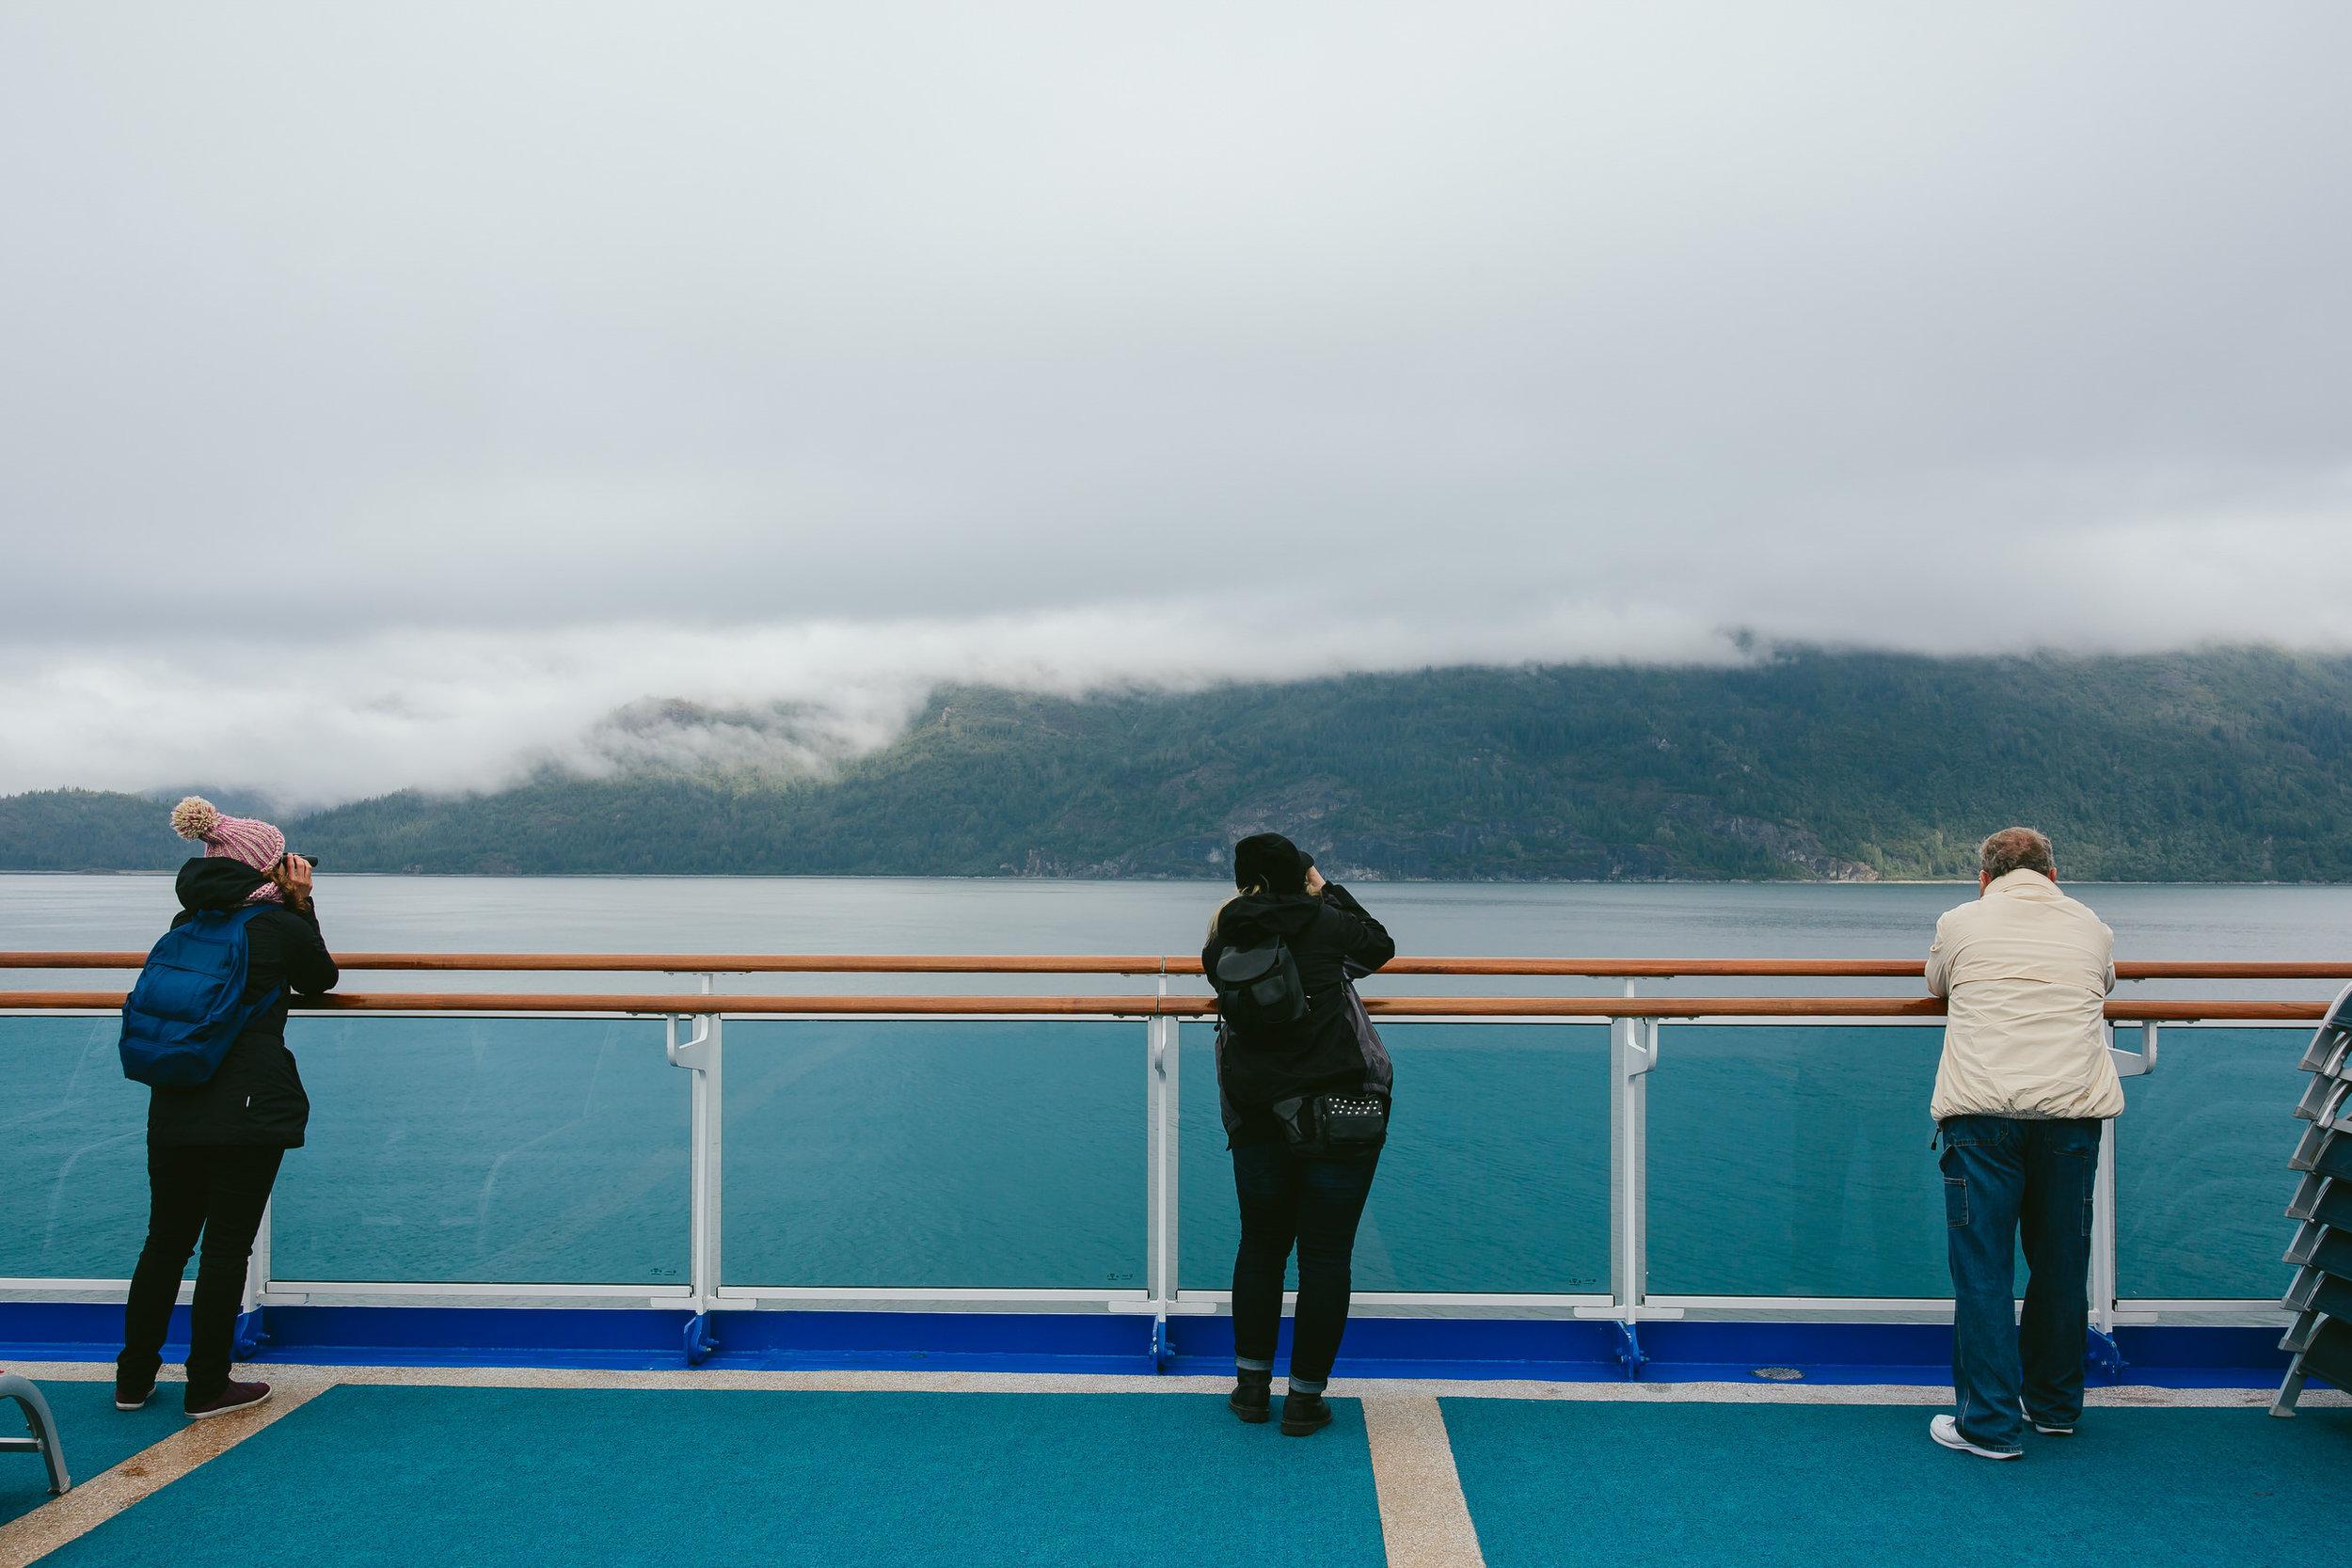 cruise-day-5 glacier bay-4.jpg